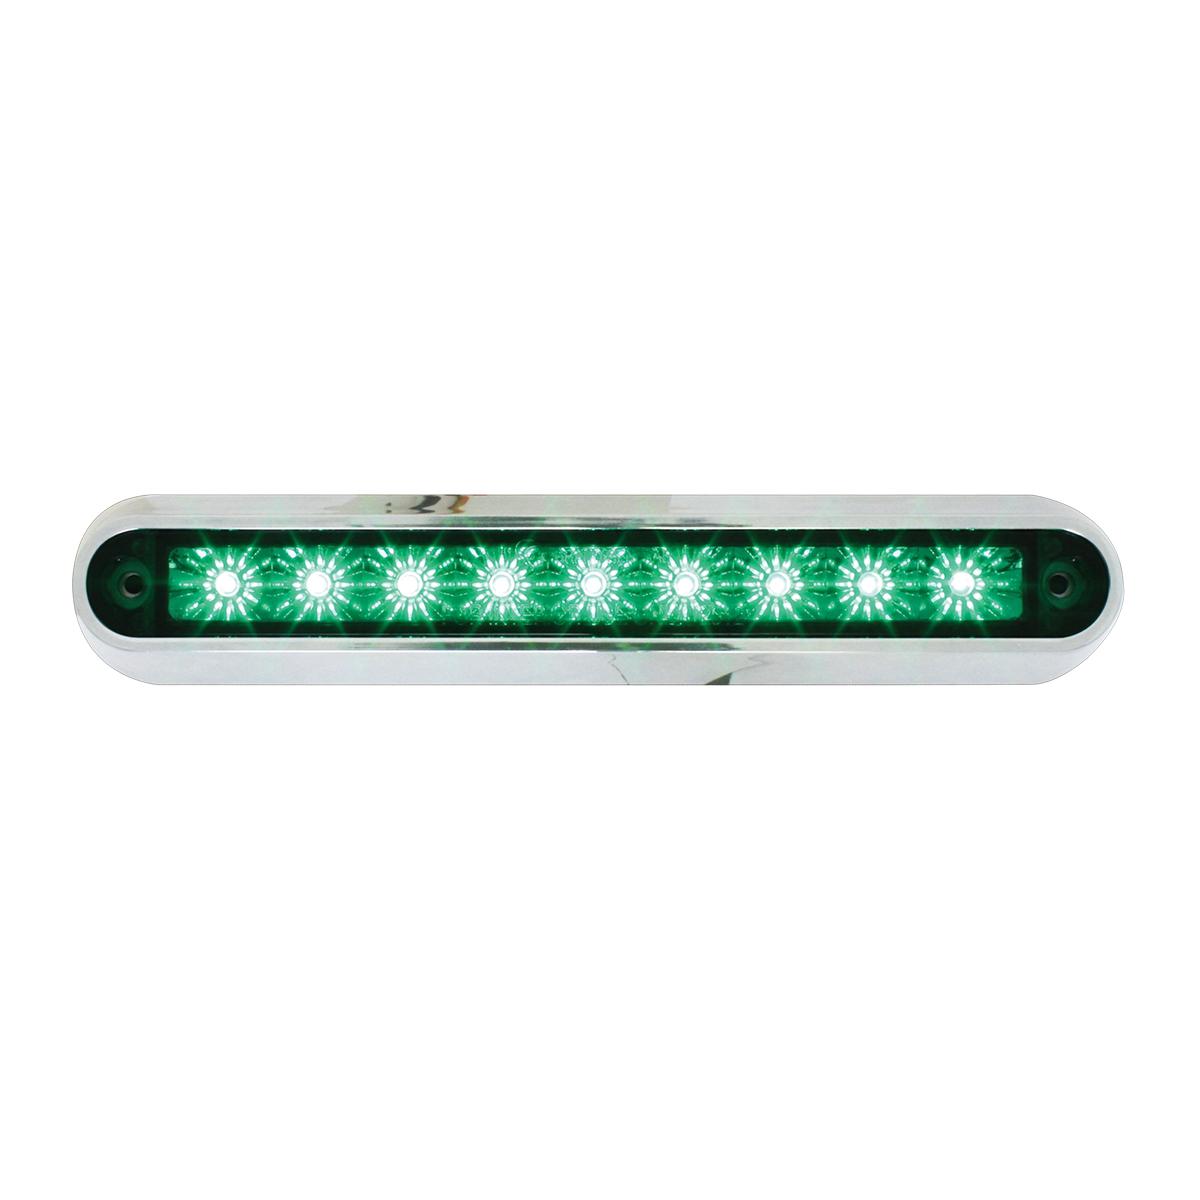 "76096 6.5"" Surface Mount LED Light Bar w/ Chrome Plastic Base"